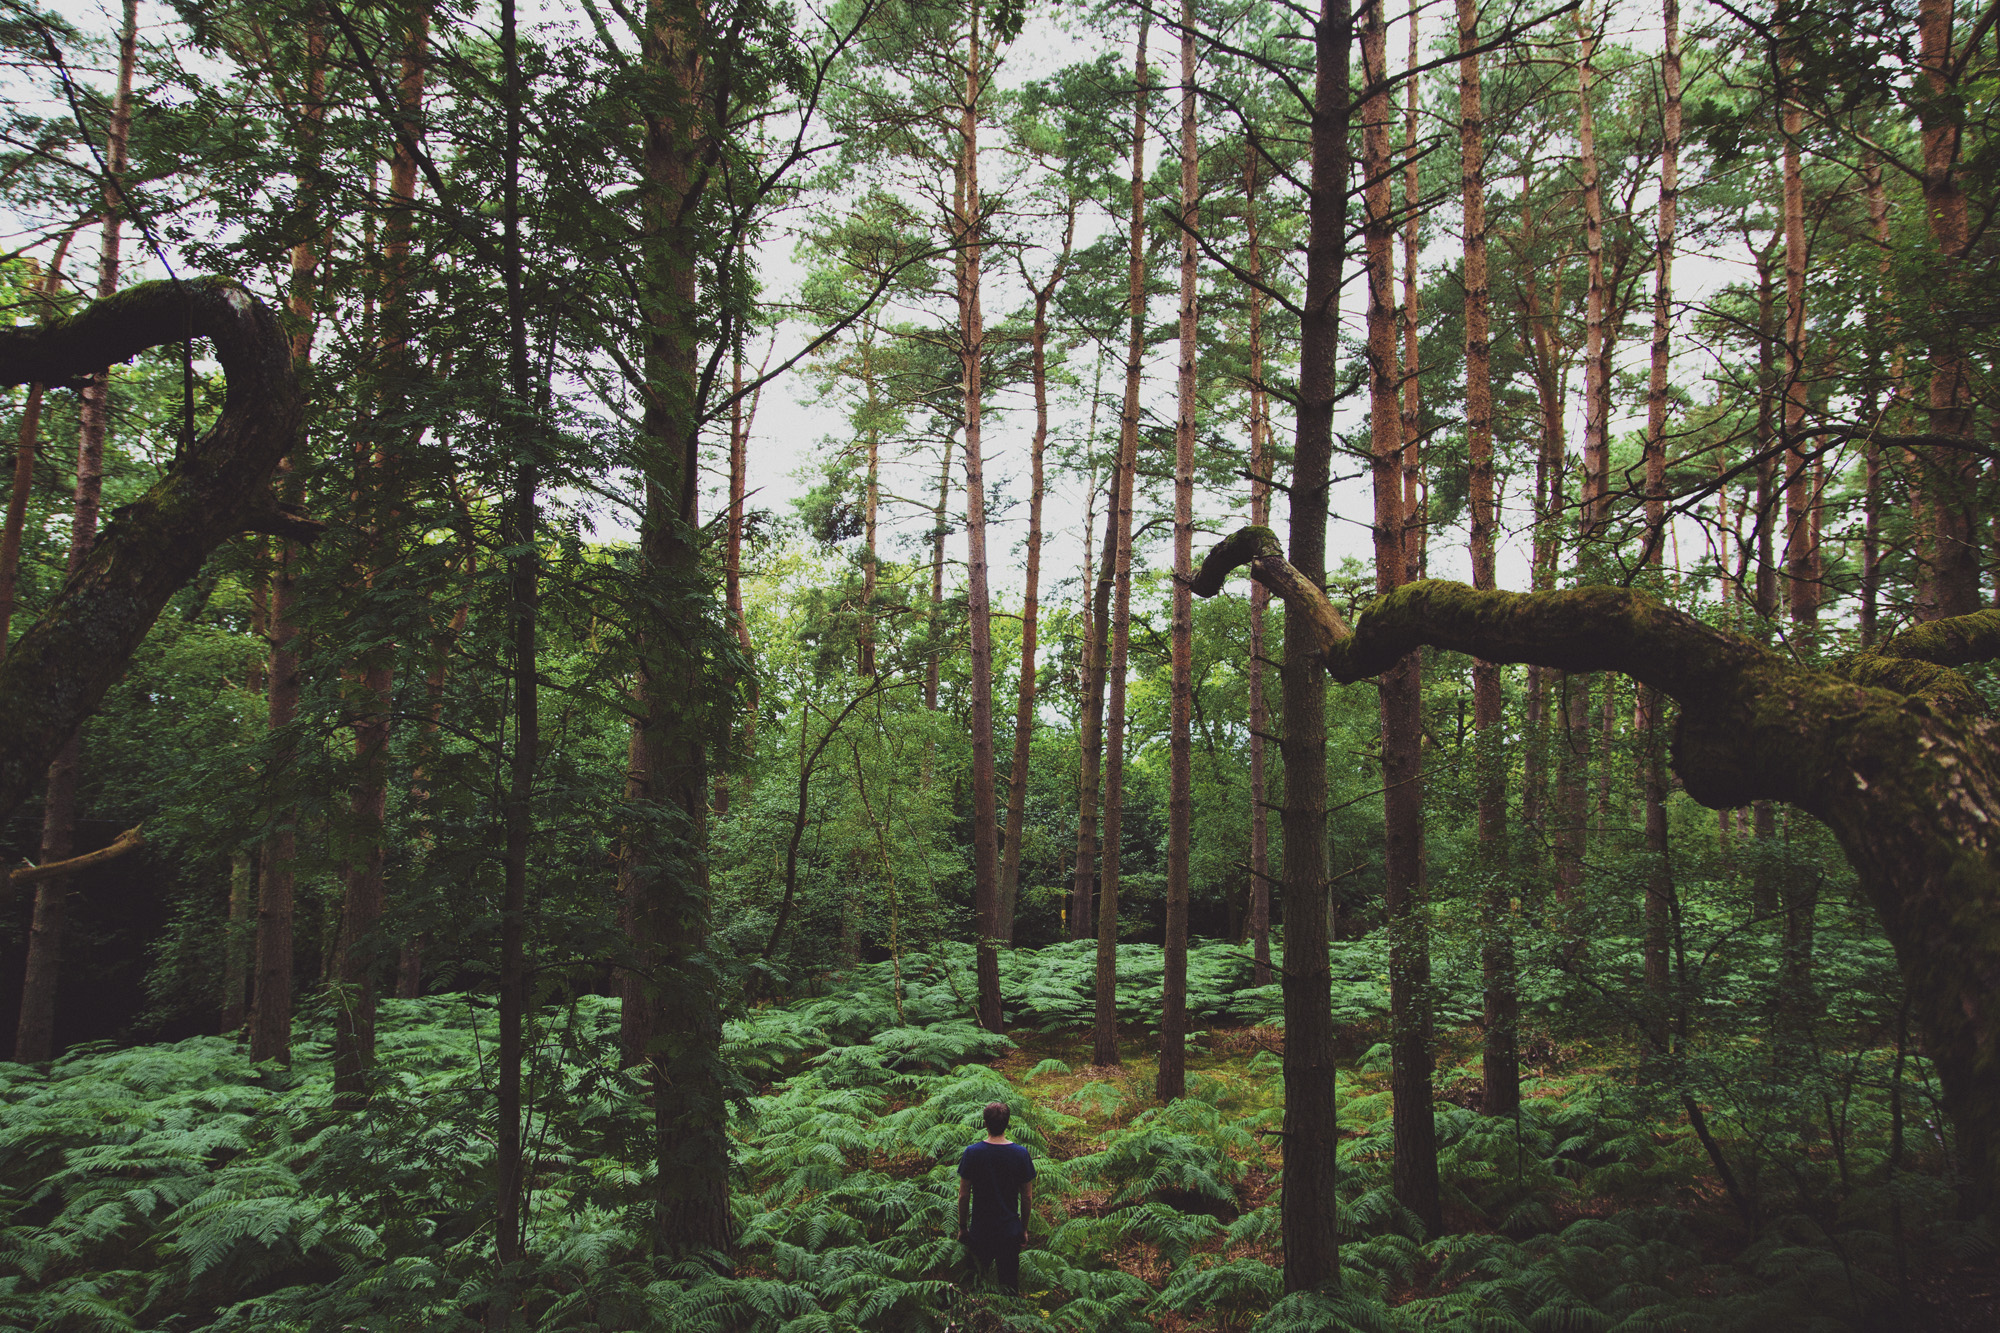 jackson in forest 2.jpg